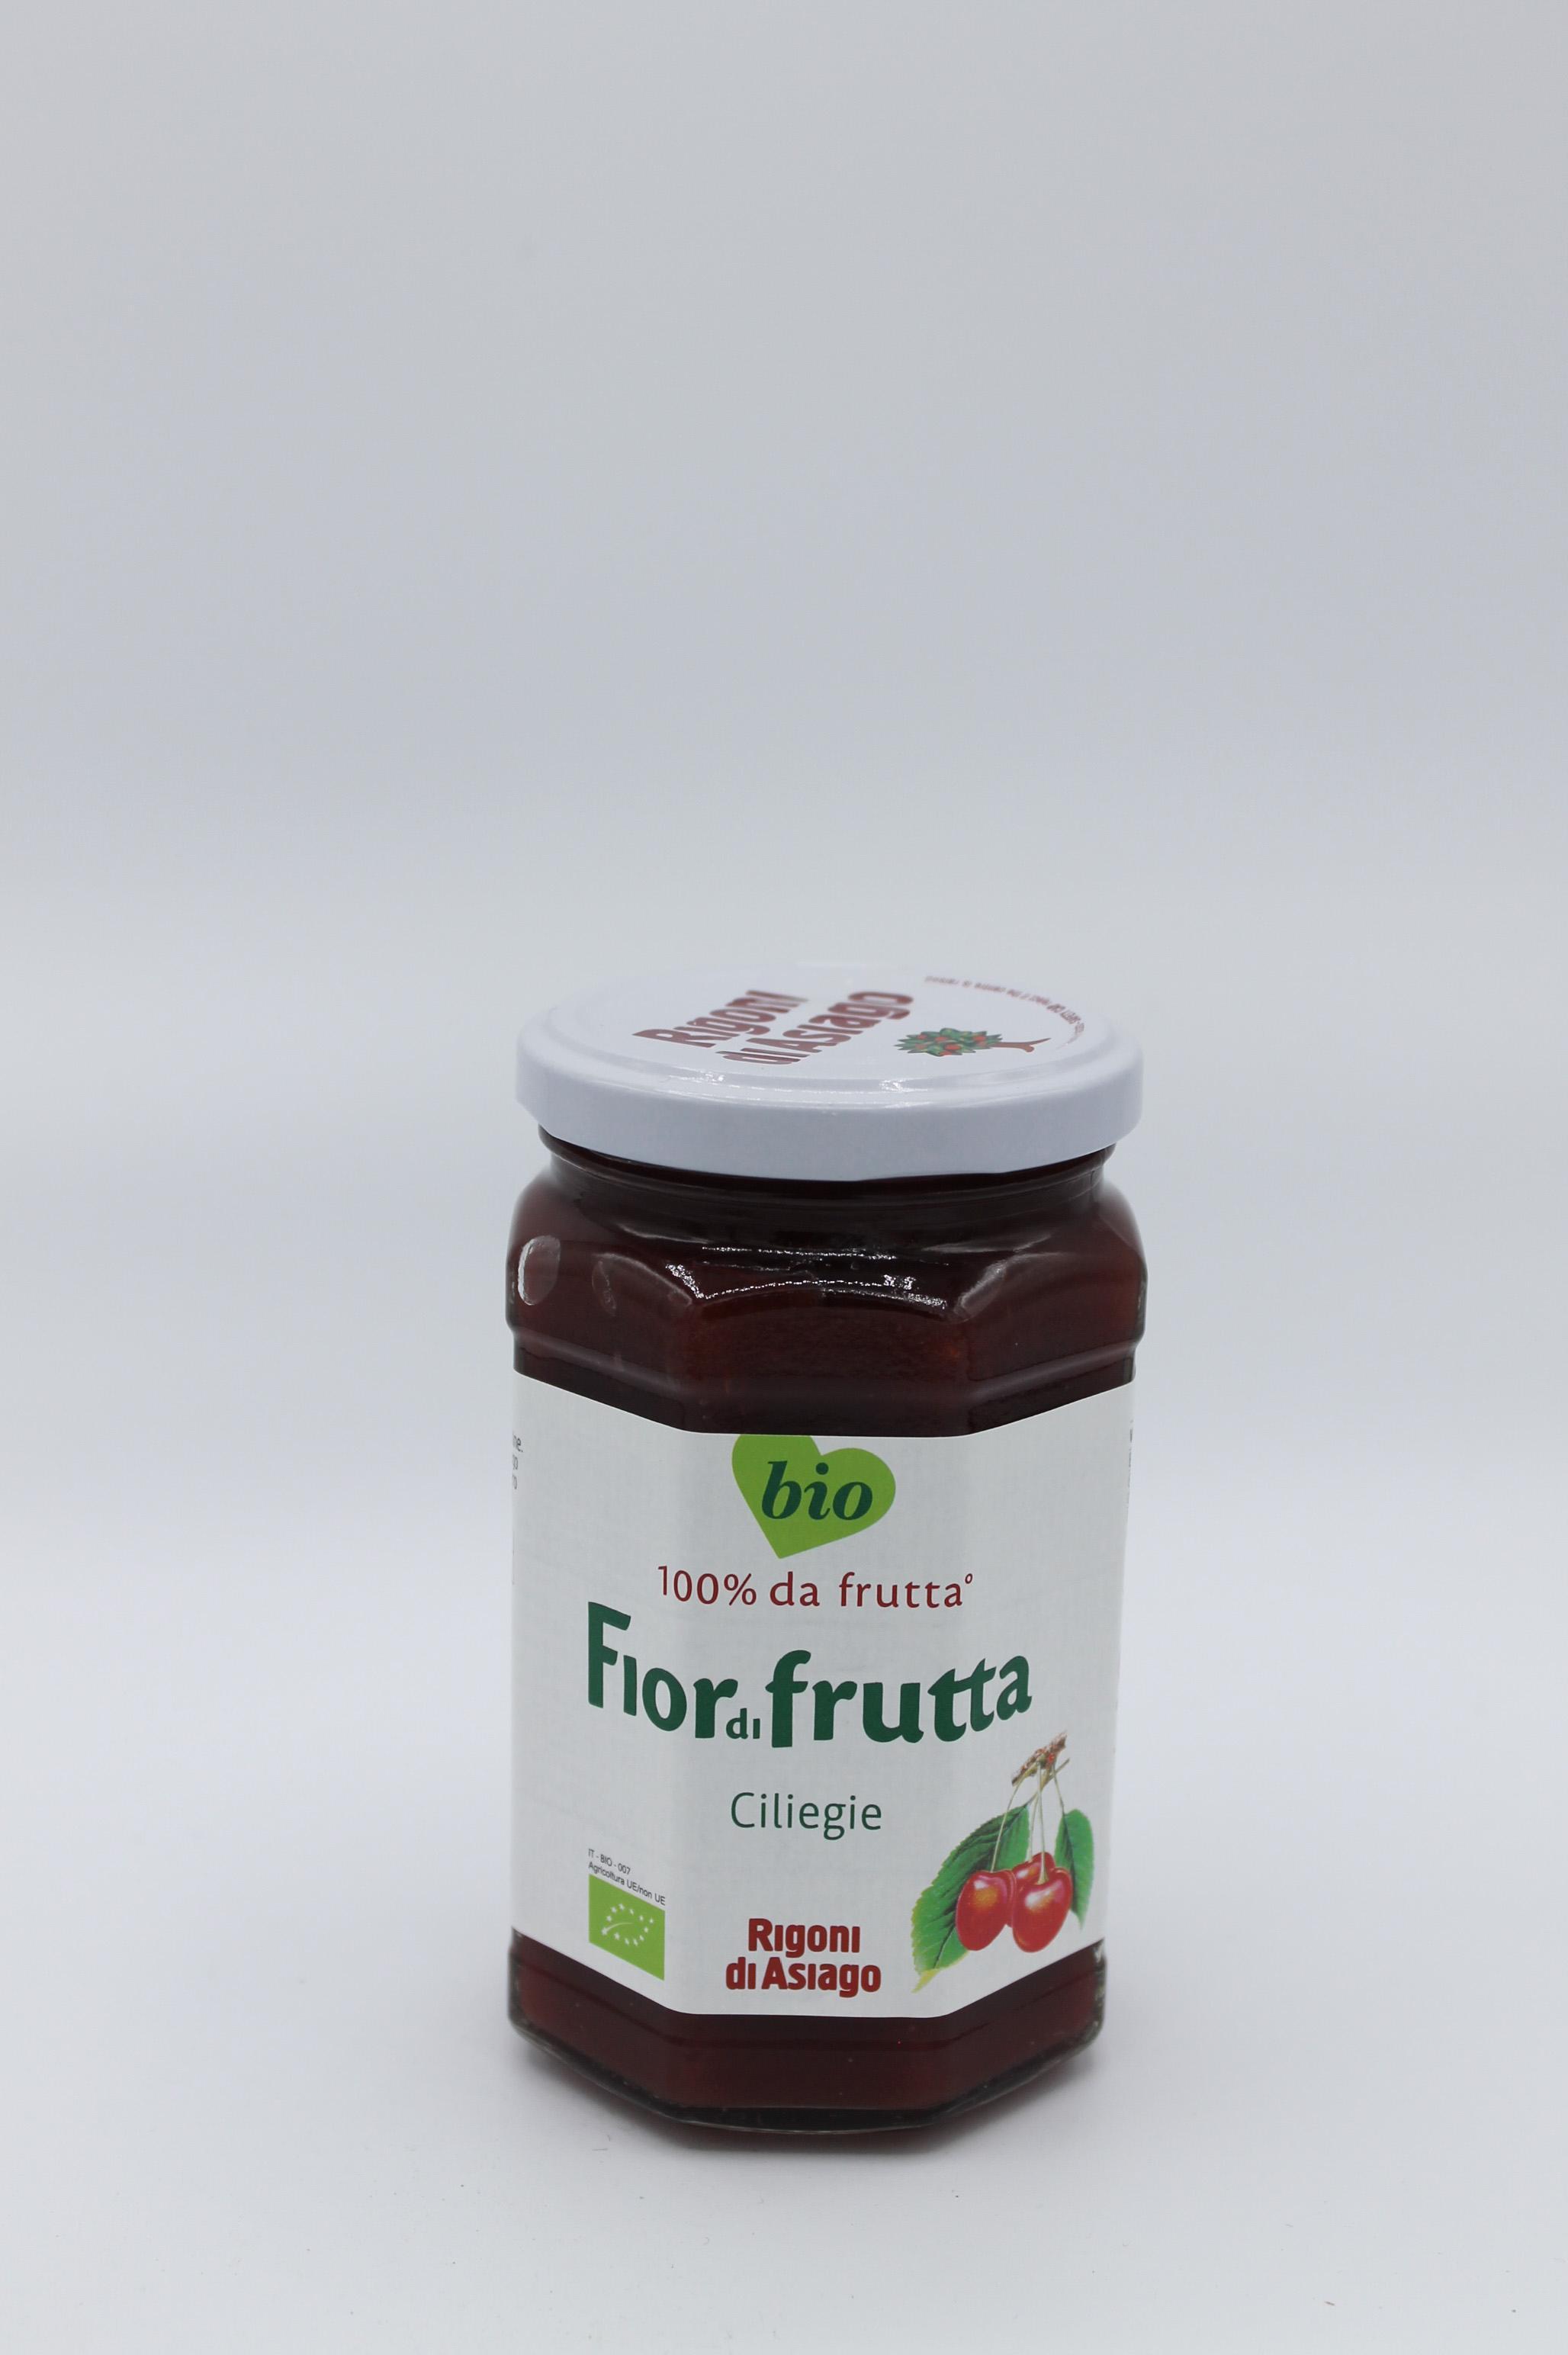 Rigoni di asiago confetture bio 330 gr vari gusti.